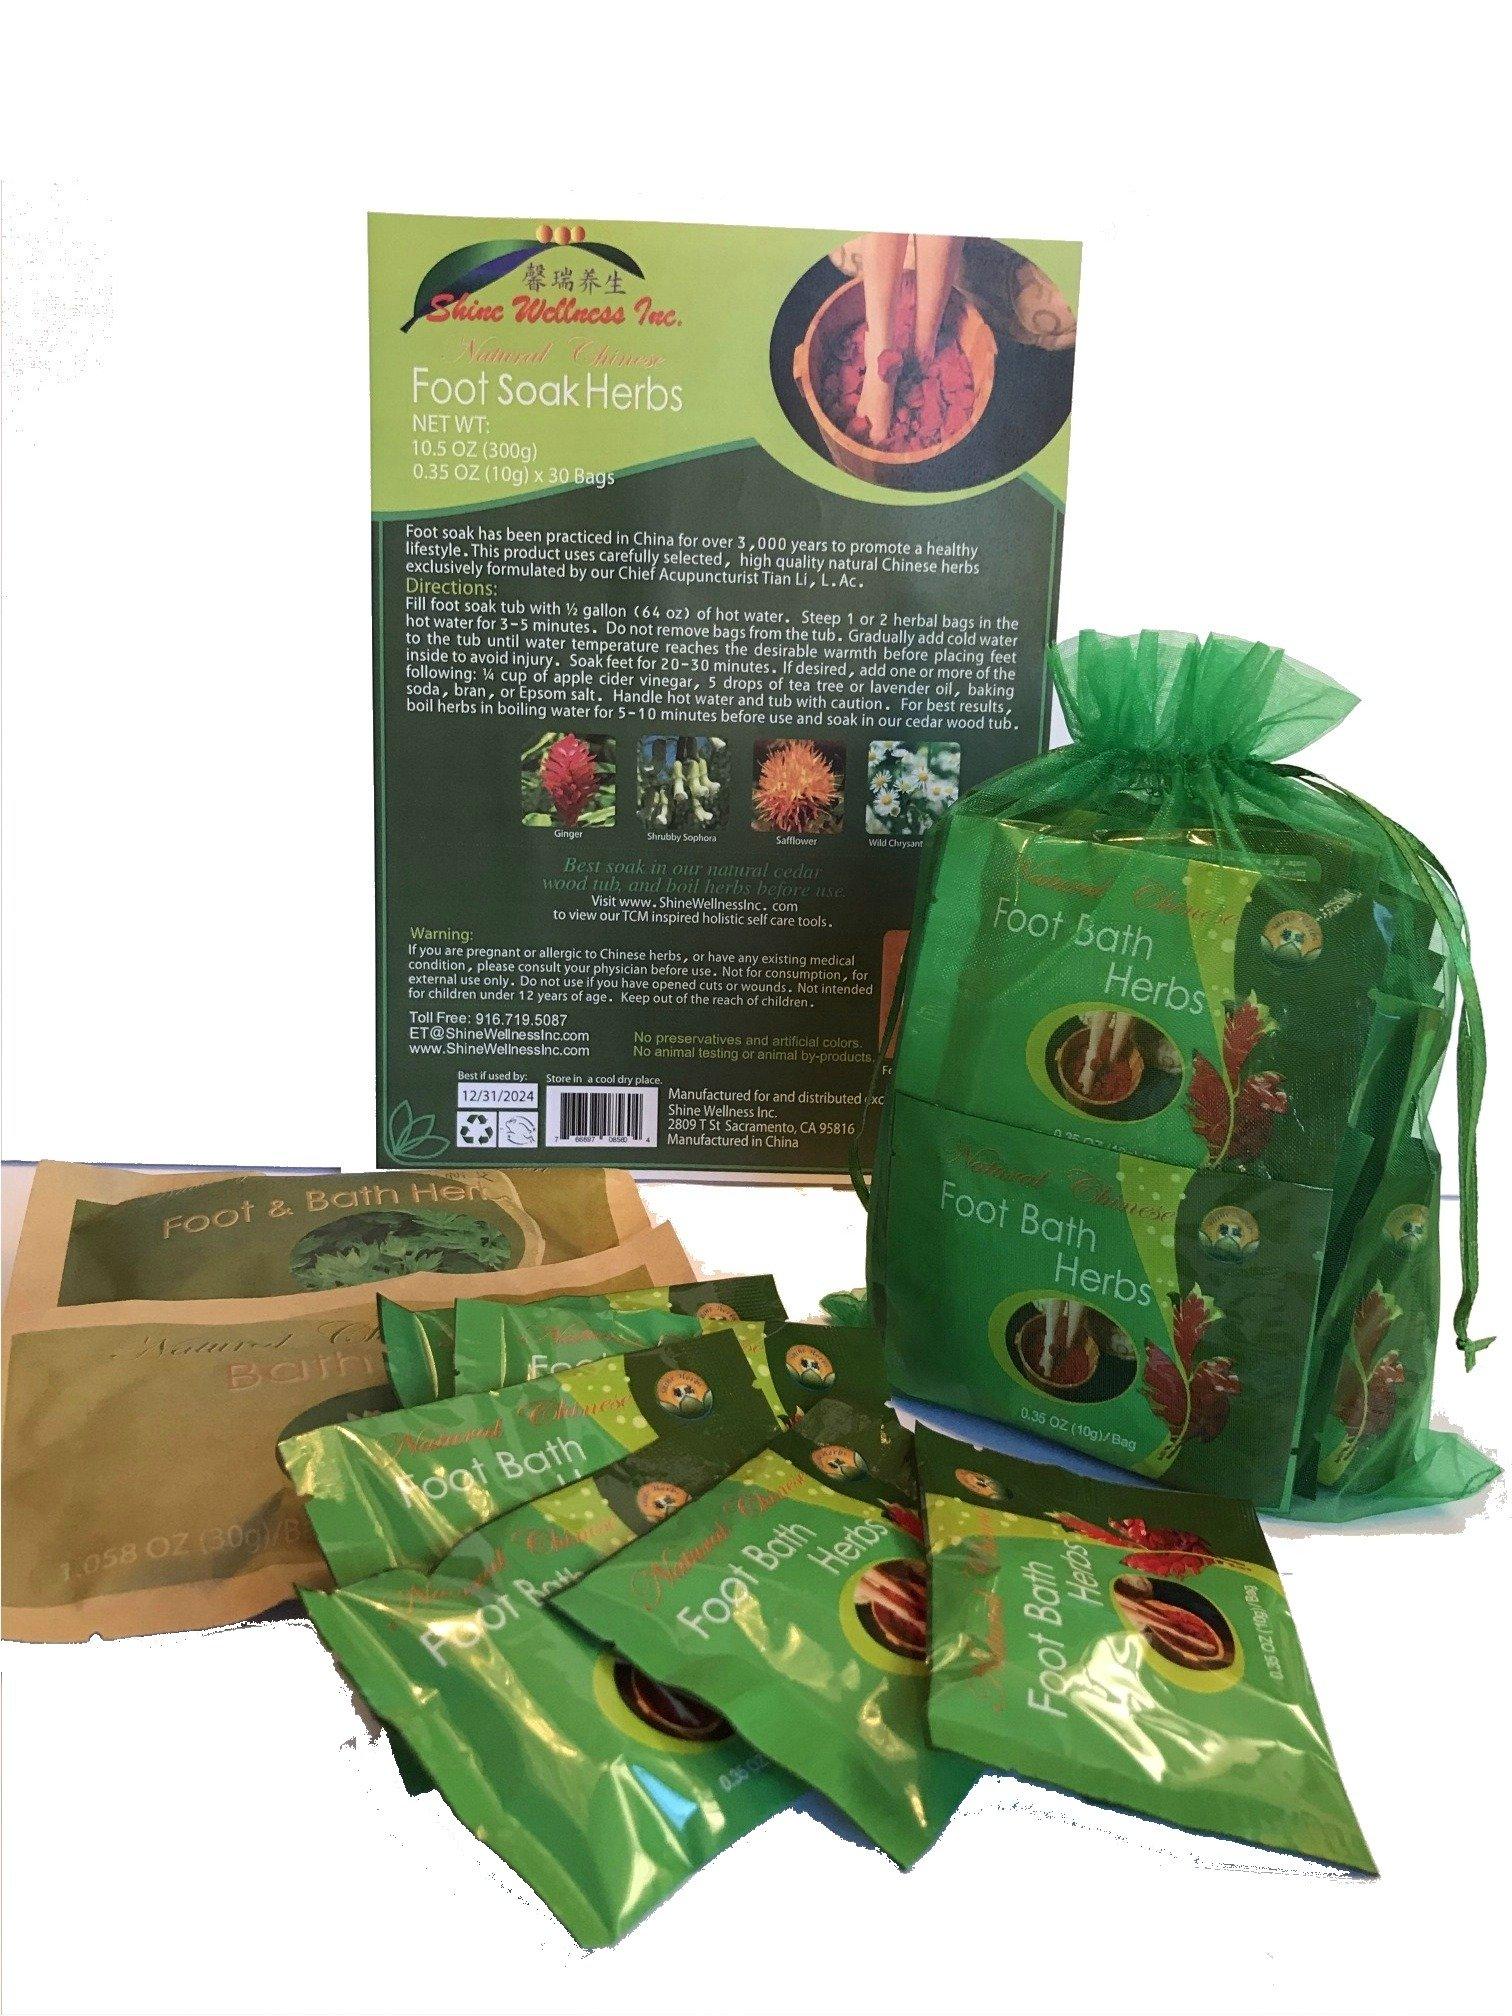 1 box Foot Soak Herbs Plus 2 FREE bags of Mugwort & Bath Herbs samples $8 Value